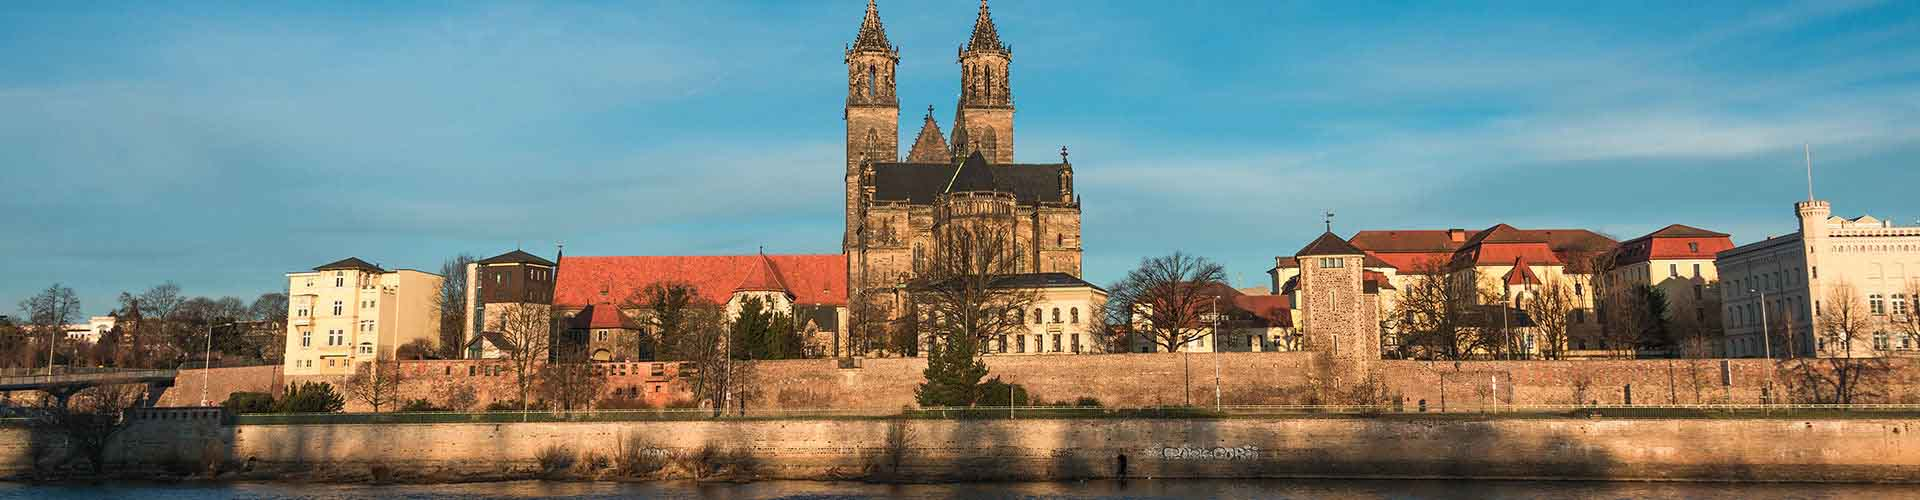 Magdeburgo - Albergues Juveniles en Magdeburgo. Mapas de Magdeburgo, Fotos y Comentarios para cada Albergue Juvenil en Magdeburgo.